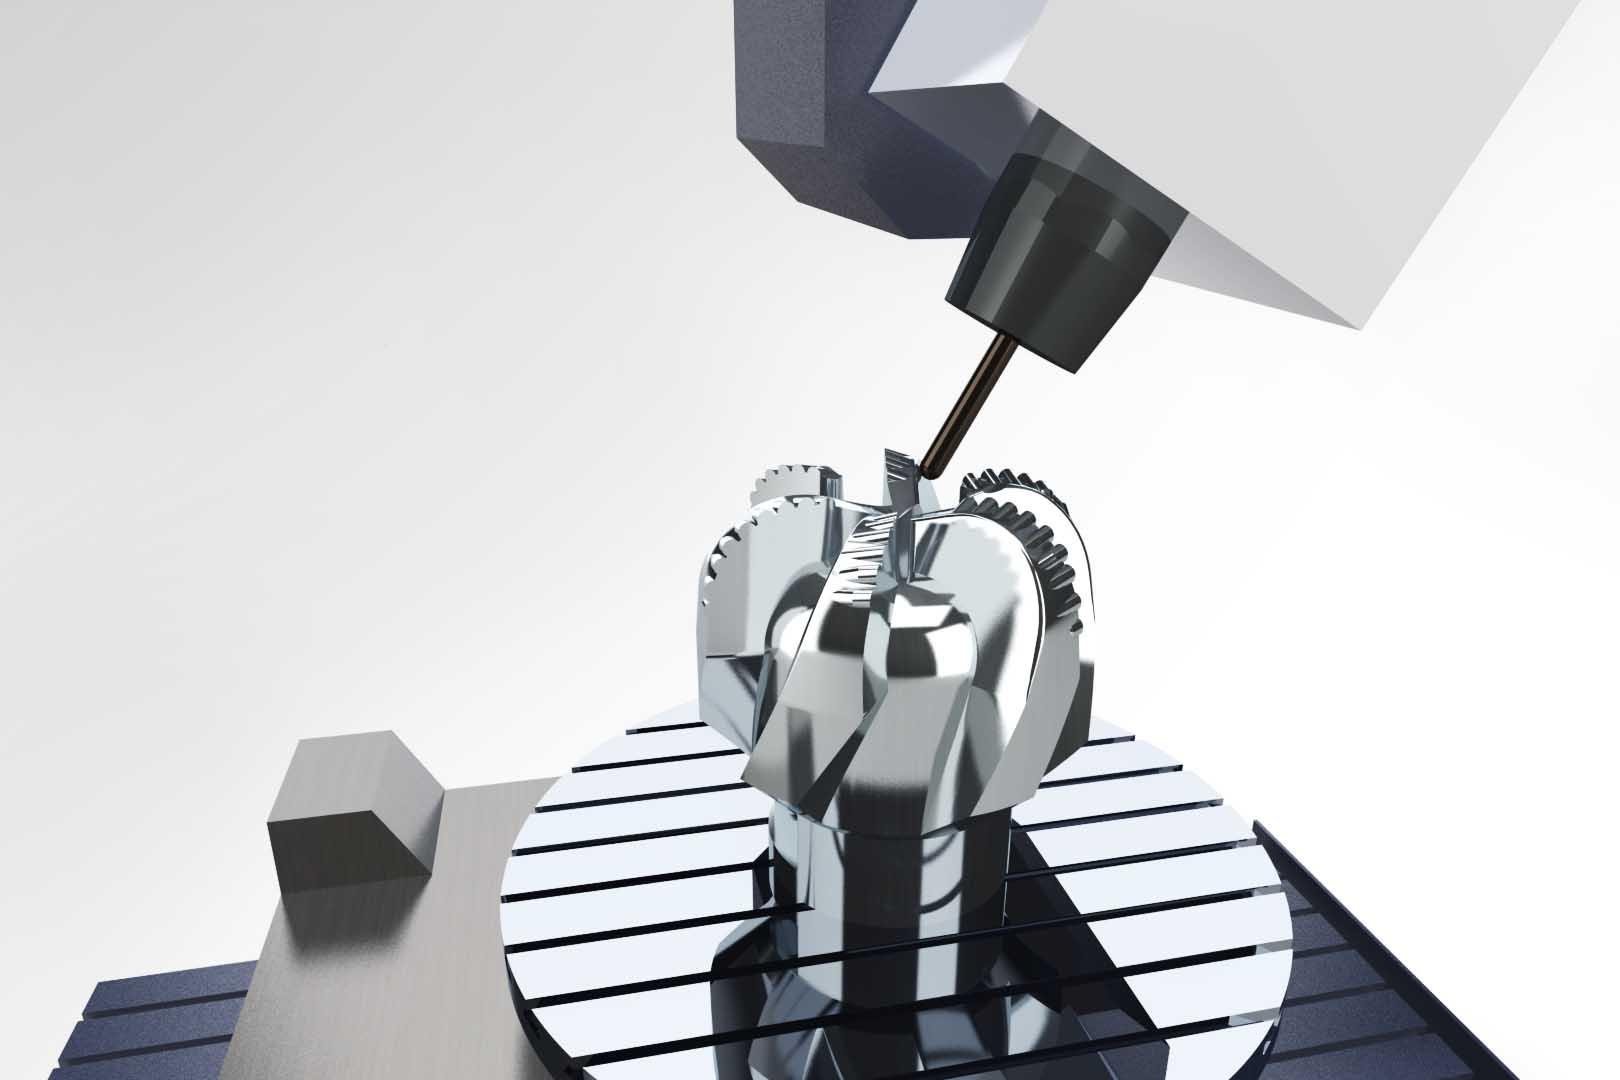 manufacturers of cad cam design software